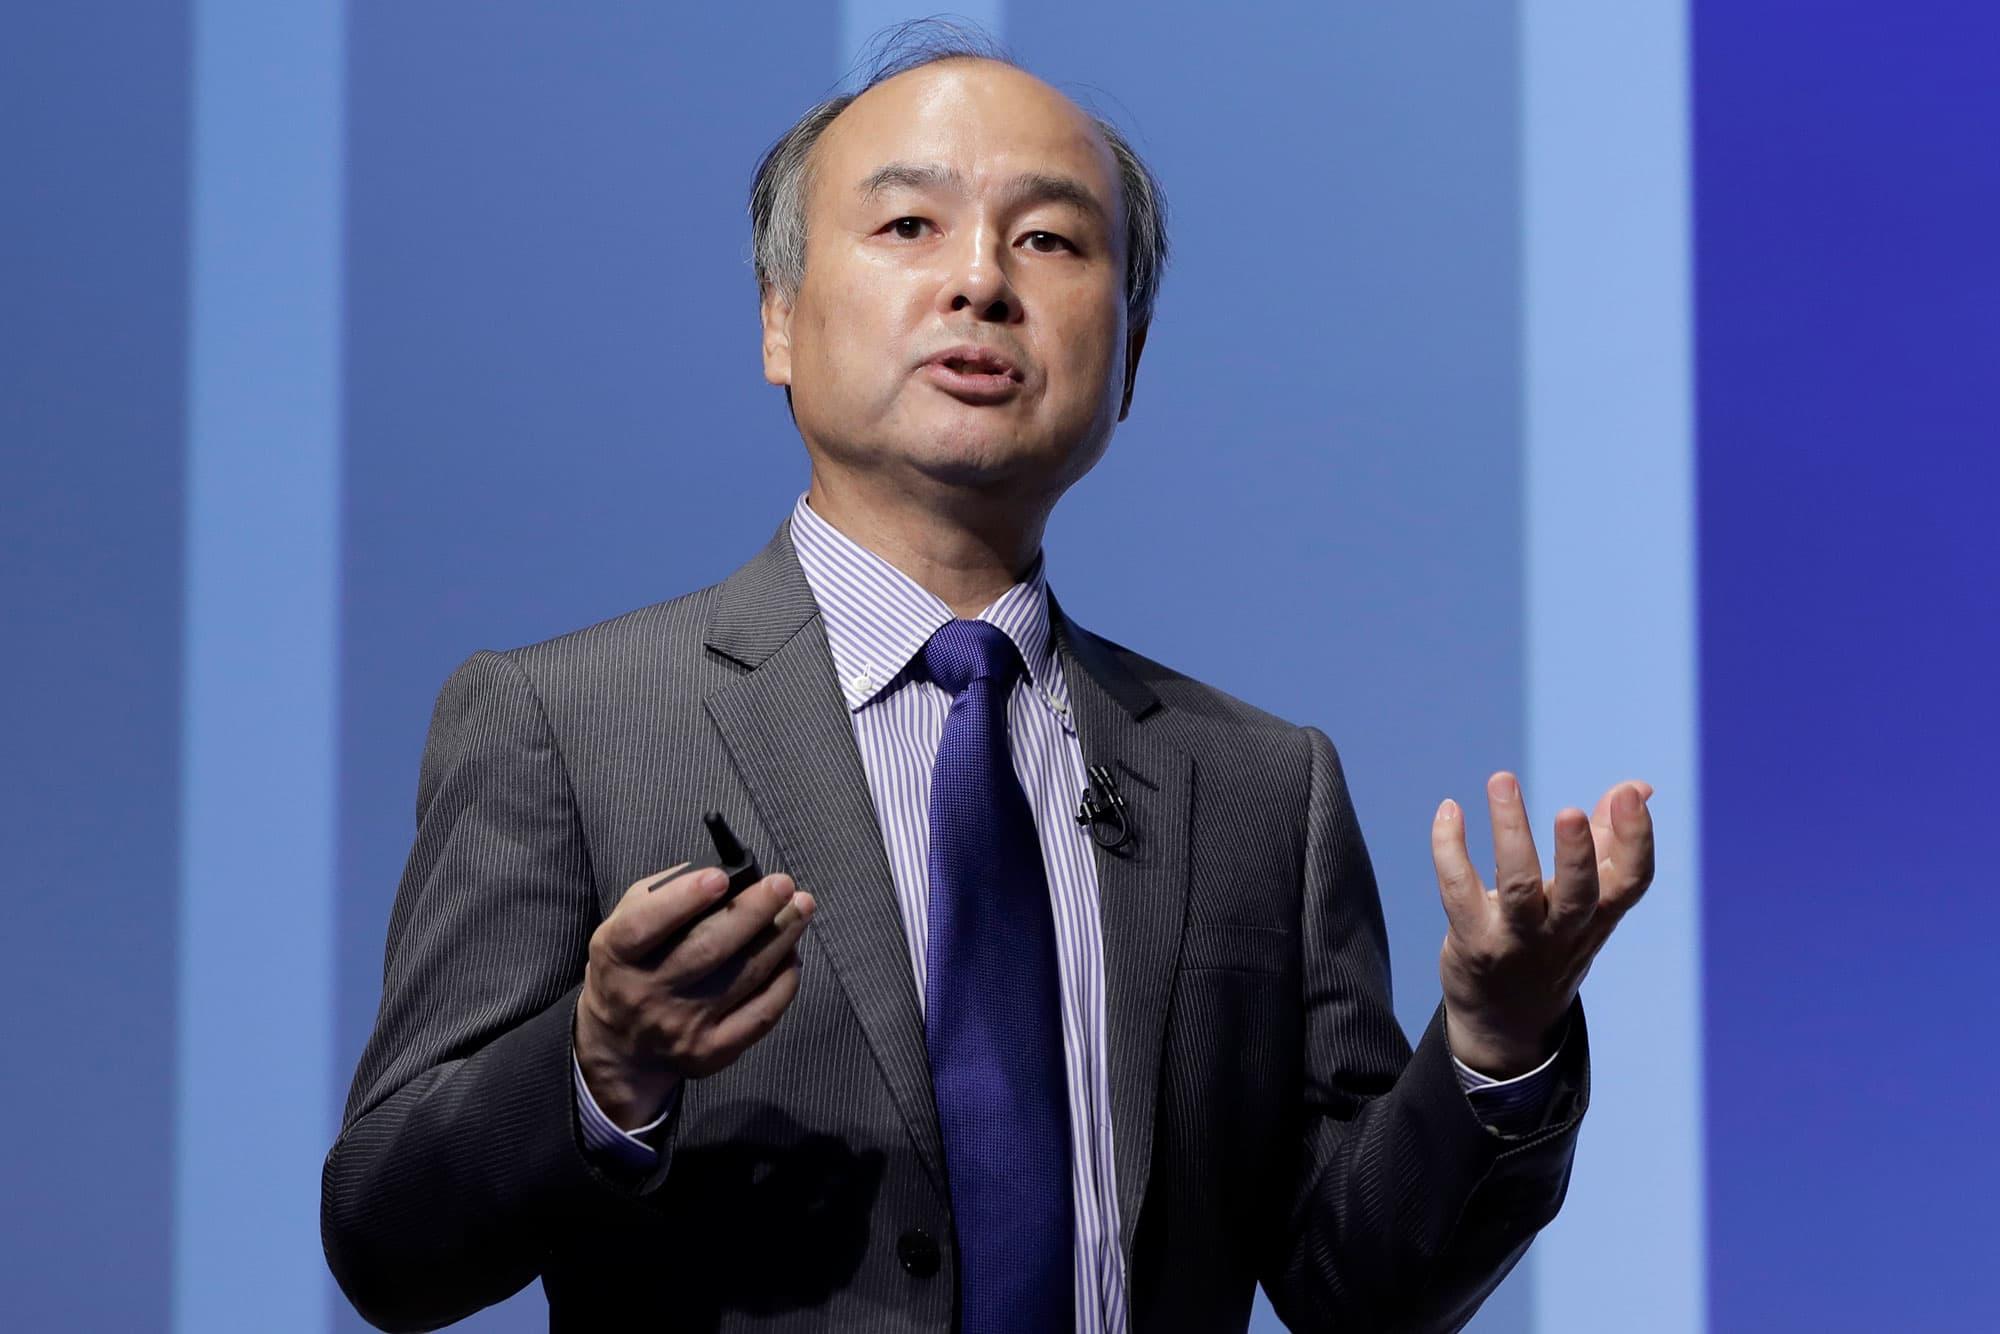 Softbank's Masayoshi Son on Uber and Lyft investments